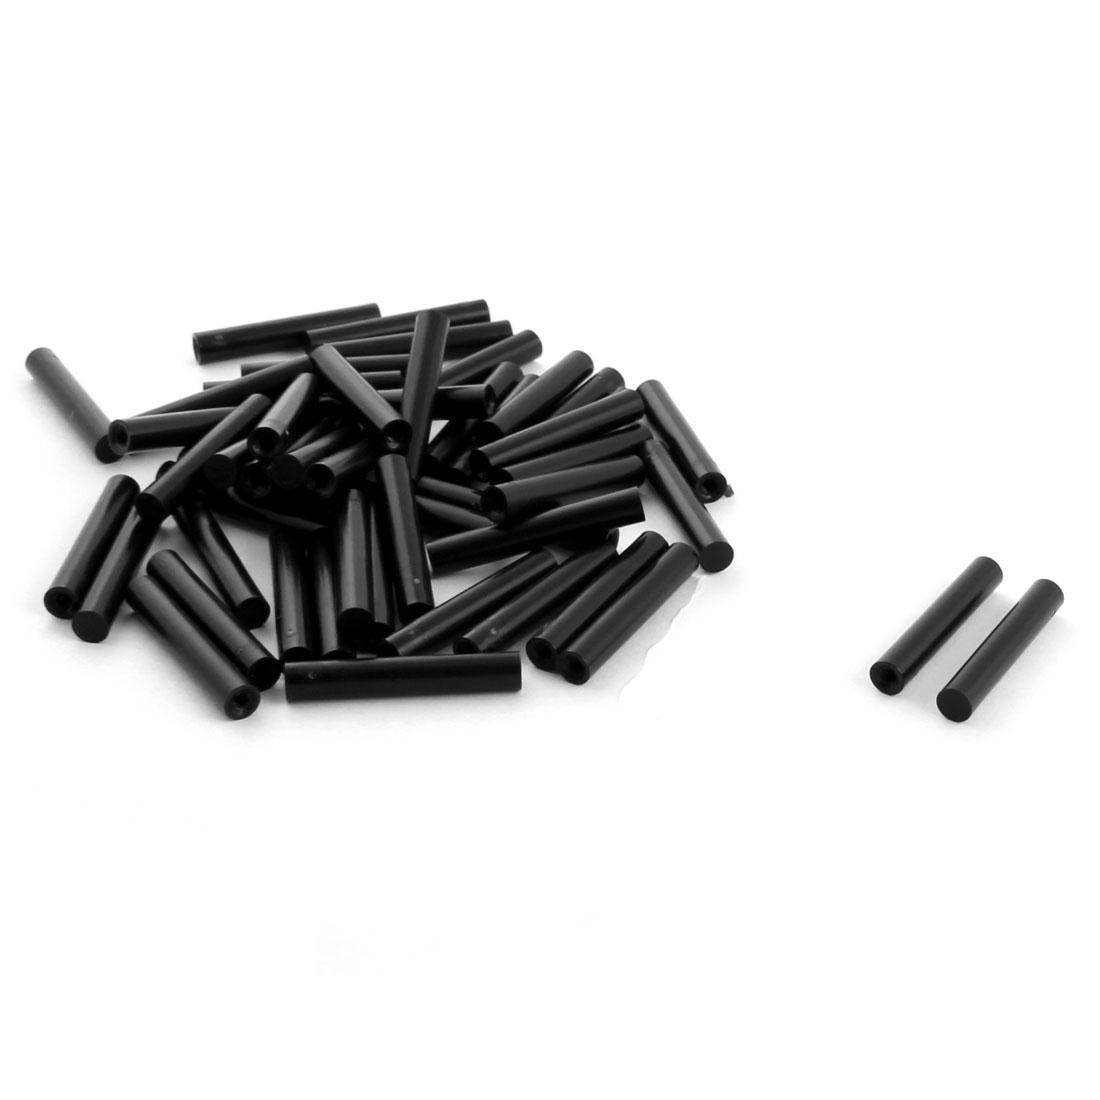 50Pcs 6x35mm PCB Test Flat End Fixture Hardware Parts Plate POM Stand Fixed Rod Black